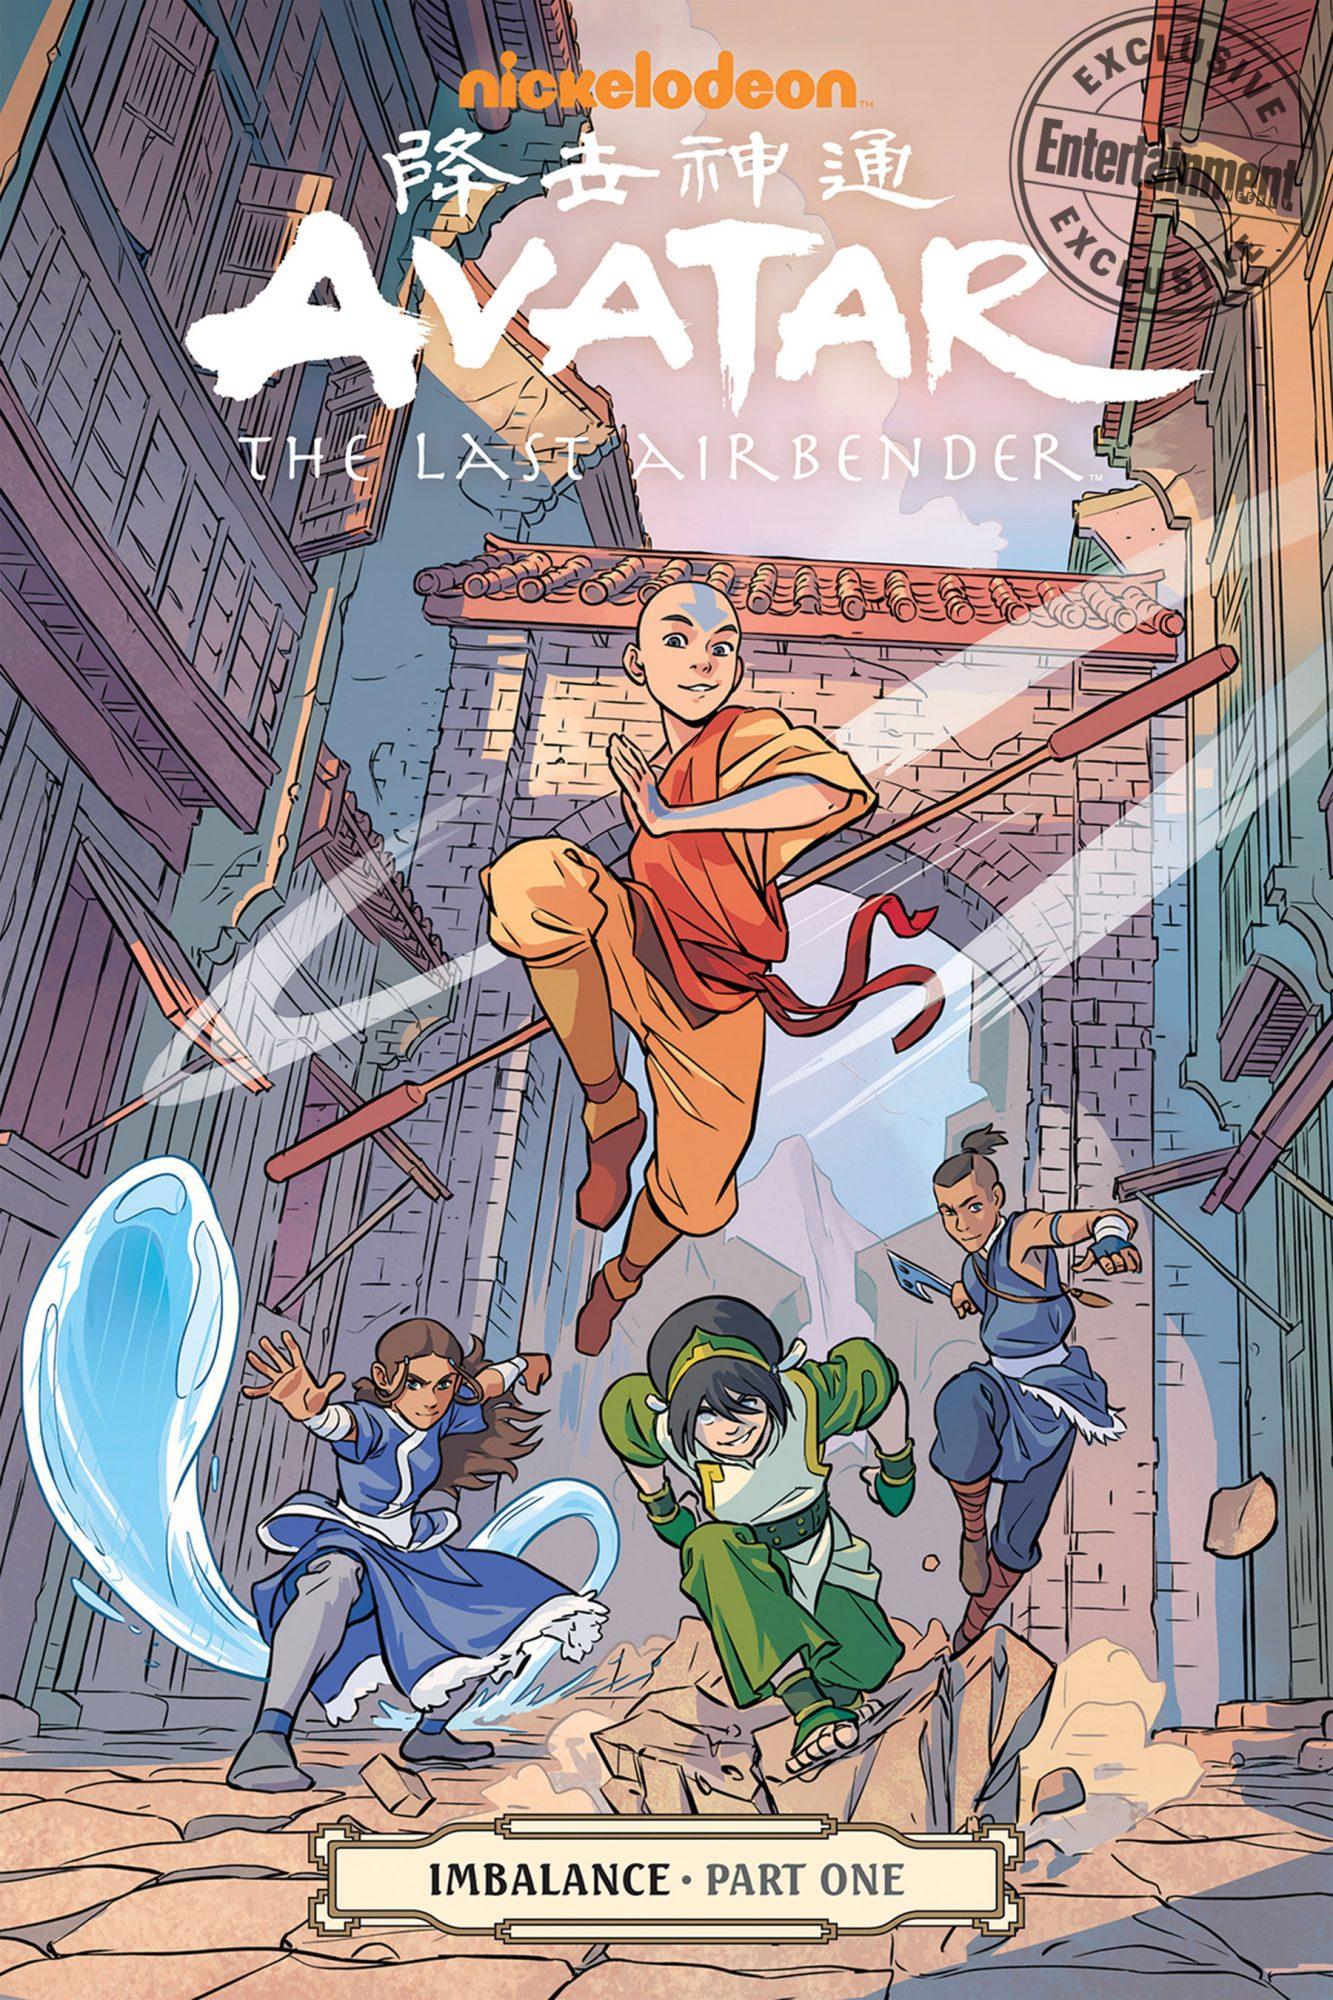 Avatar Comics Release Dates : avatar, comics, release, dates, Horse, Announces, Avatar:, Airbender, Comics, EW.com